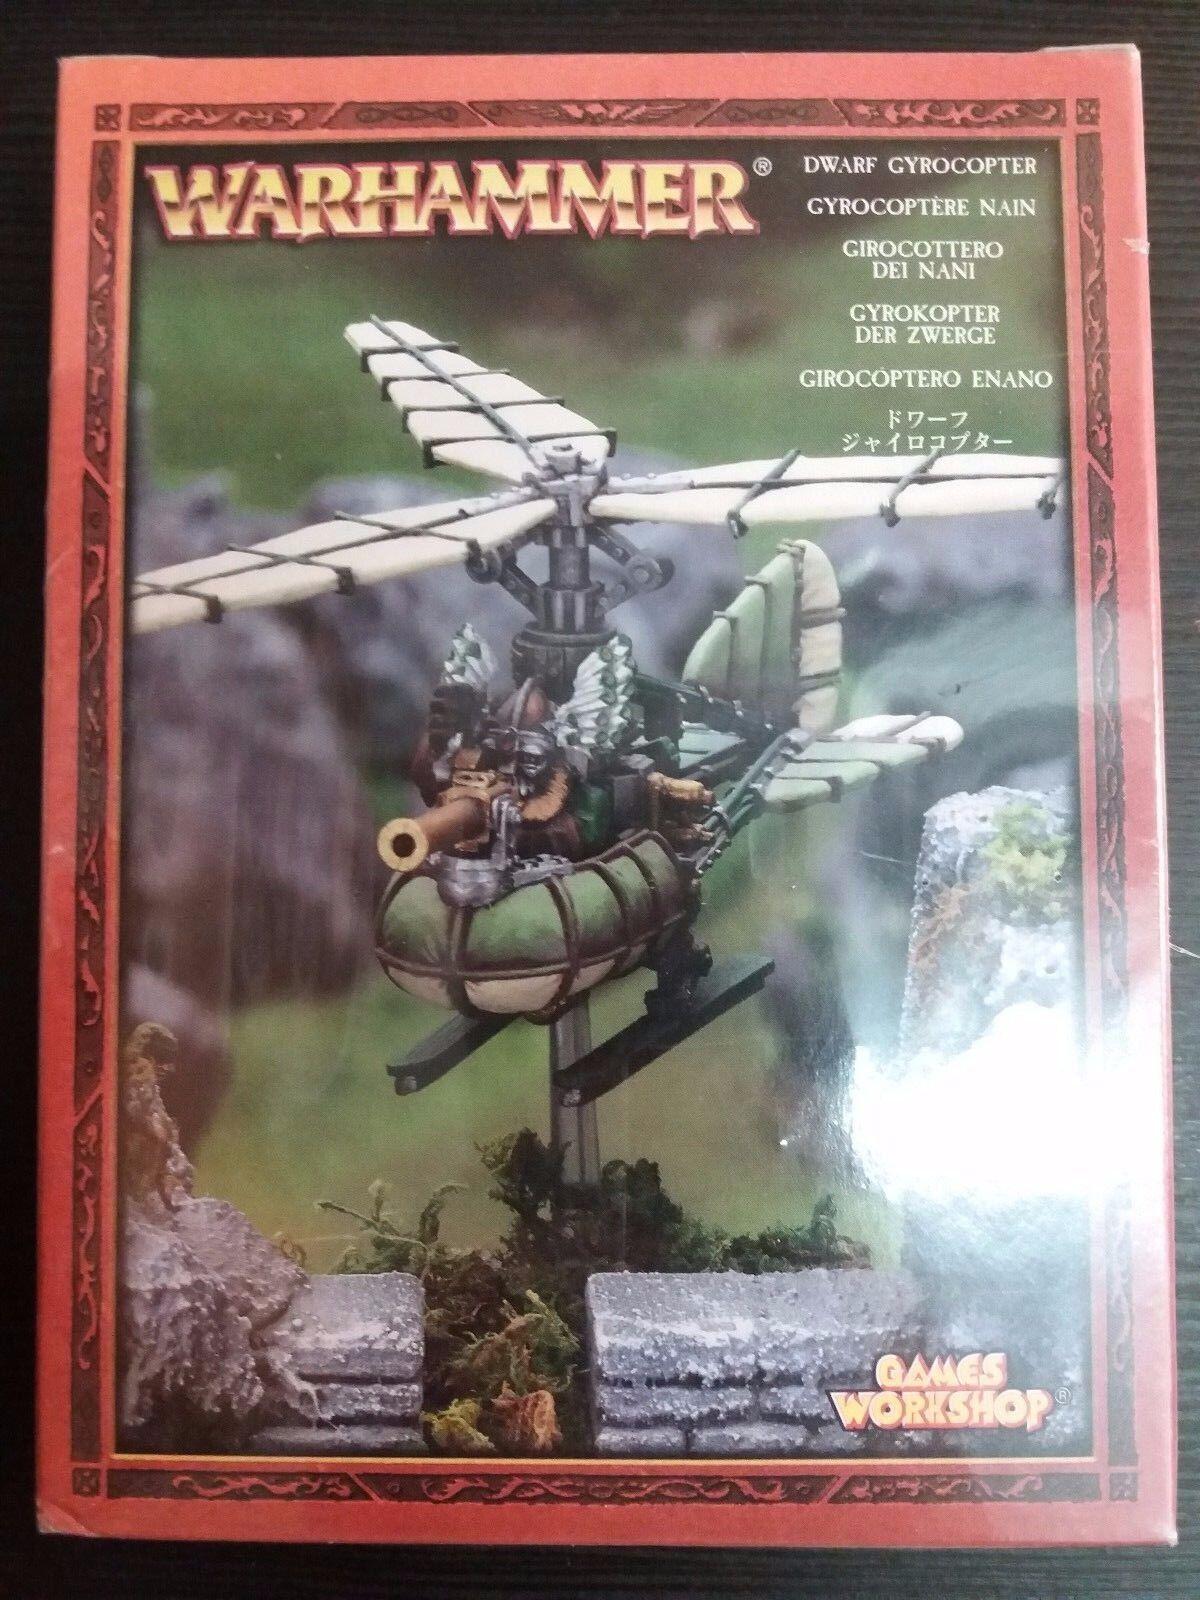 Warhammer Fantasia Sigmar - Dwarf Girocóptero Girocoptero Enano - New Sealed